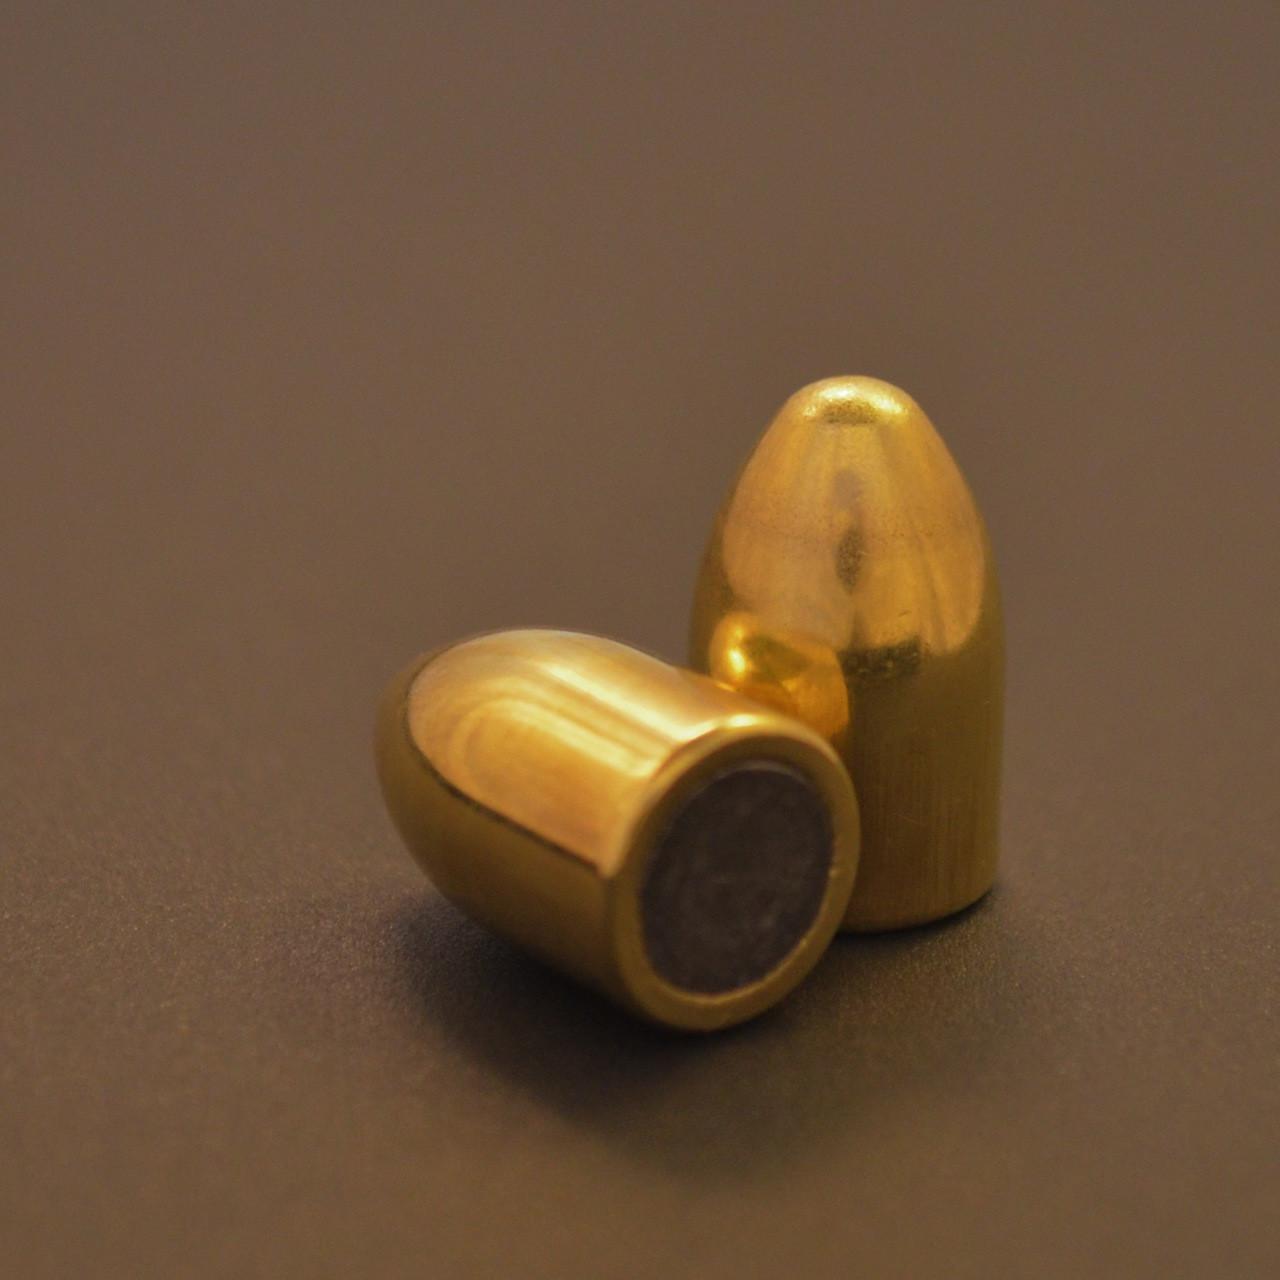 9mm/124gr FMJ - 1,000ct